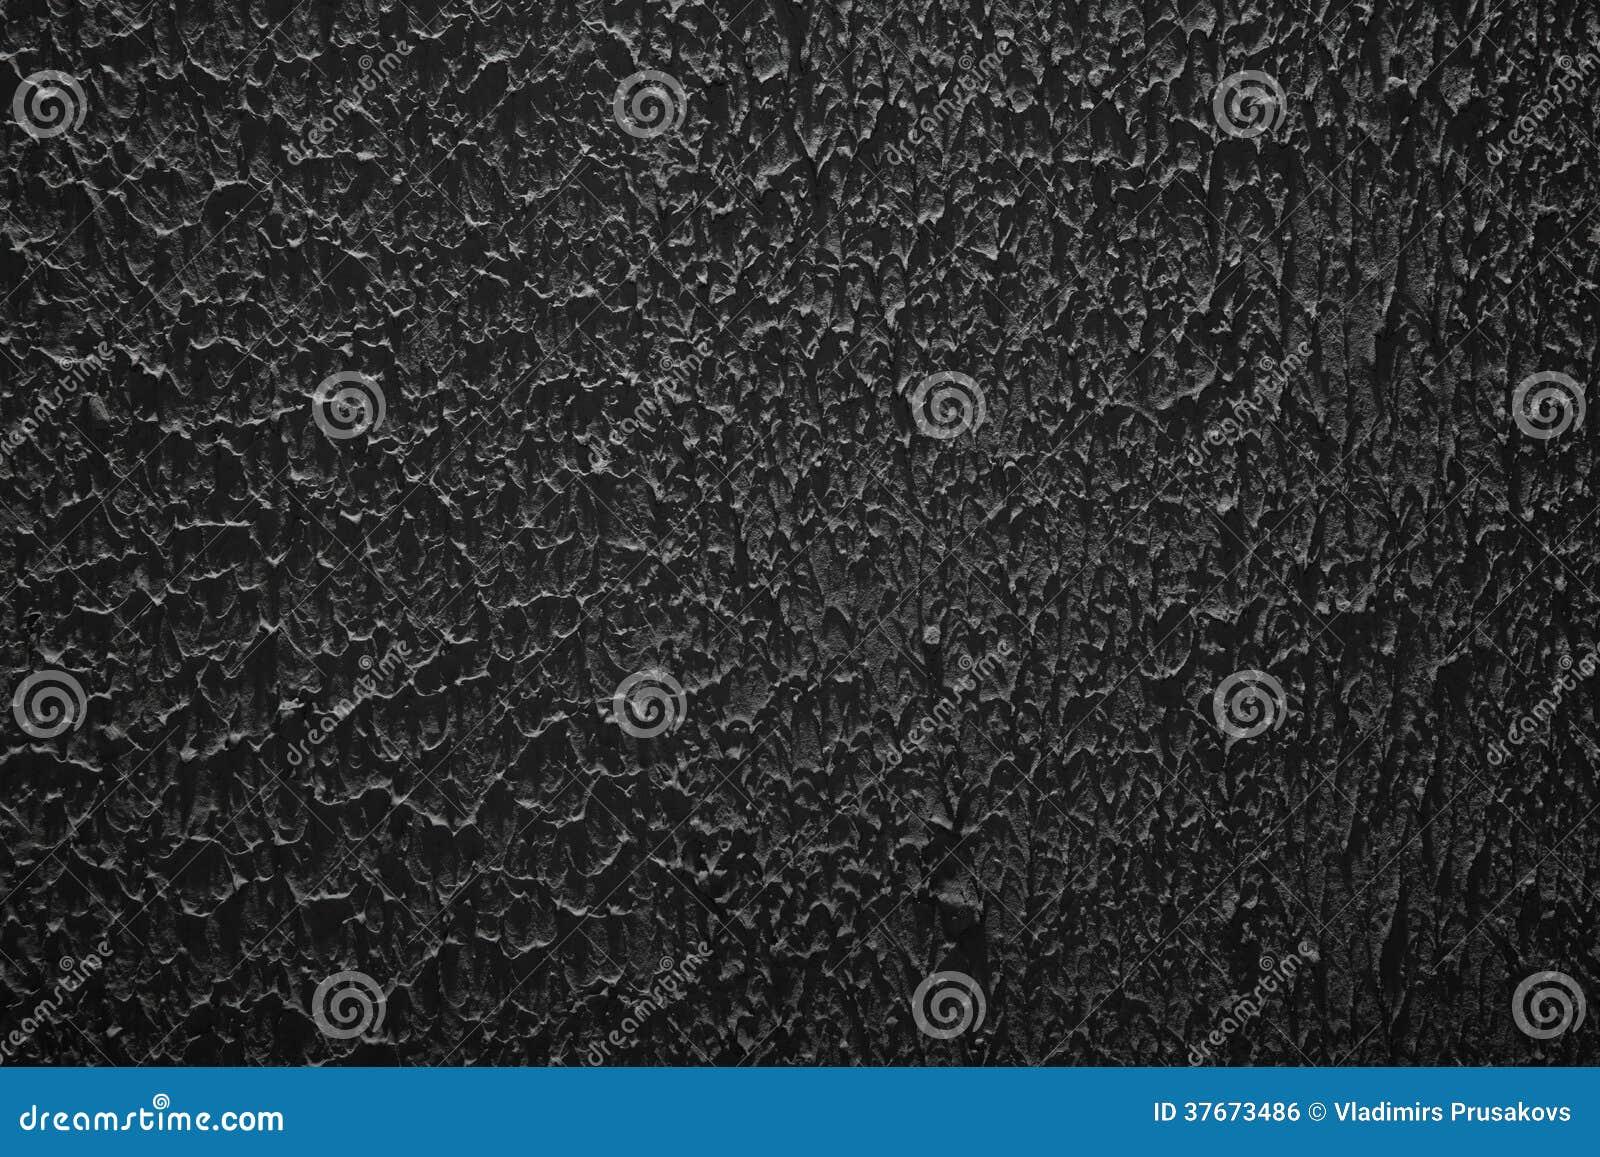 grunge texture, rough ragged dark background, black plaster stucco wall